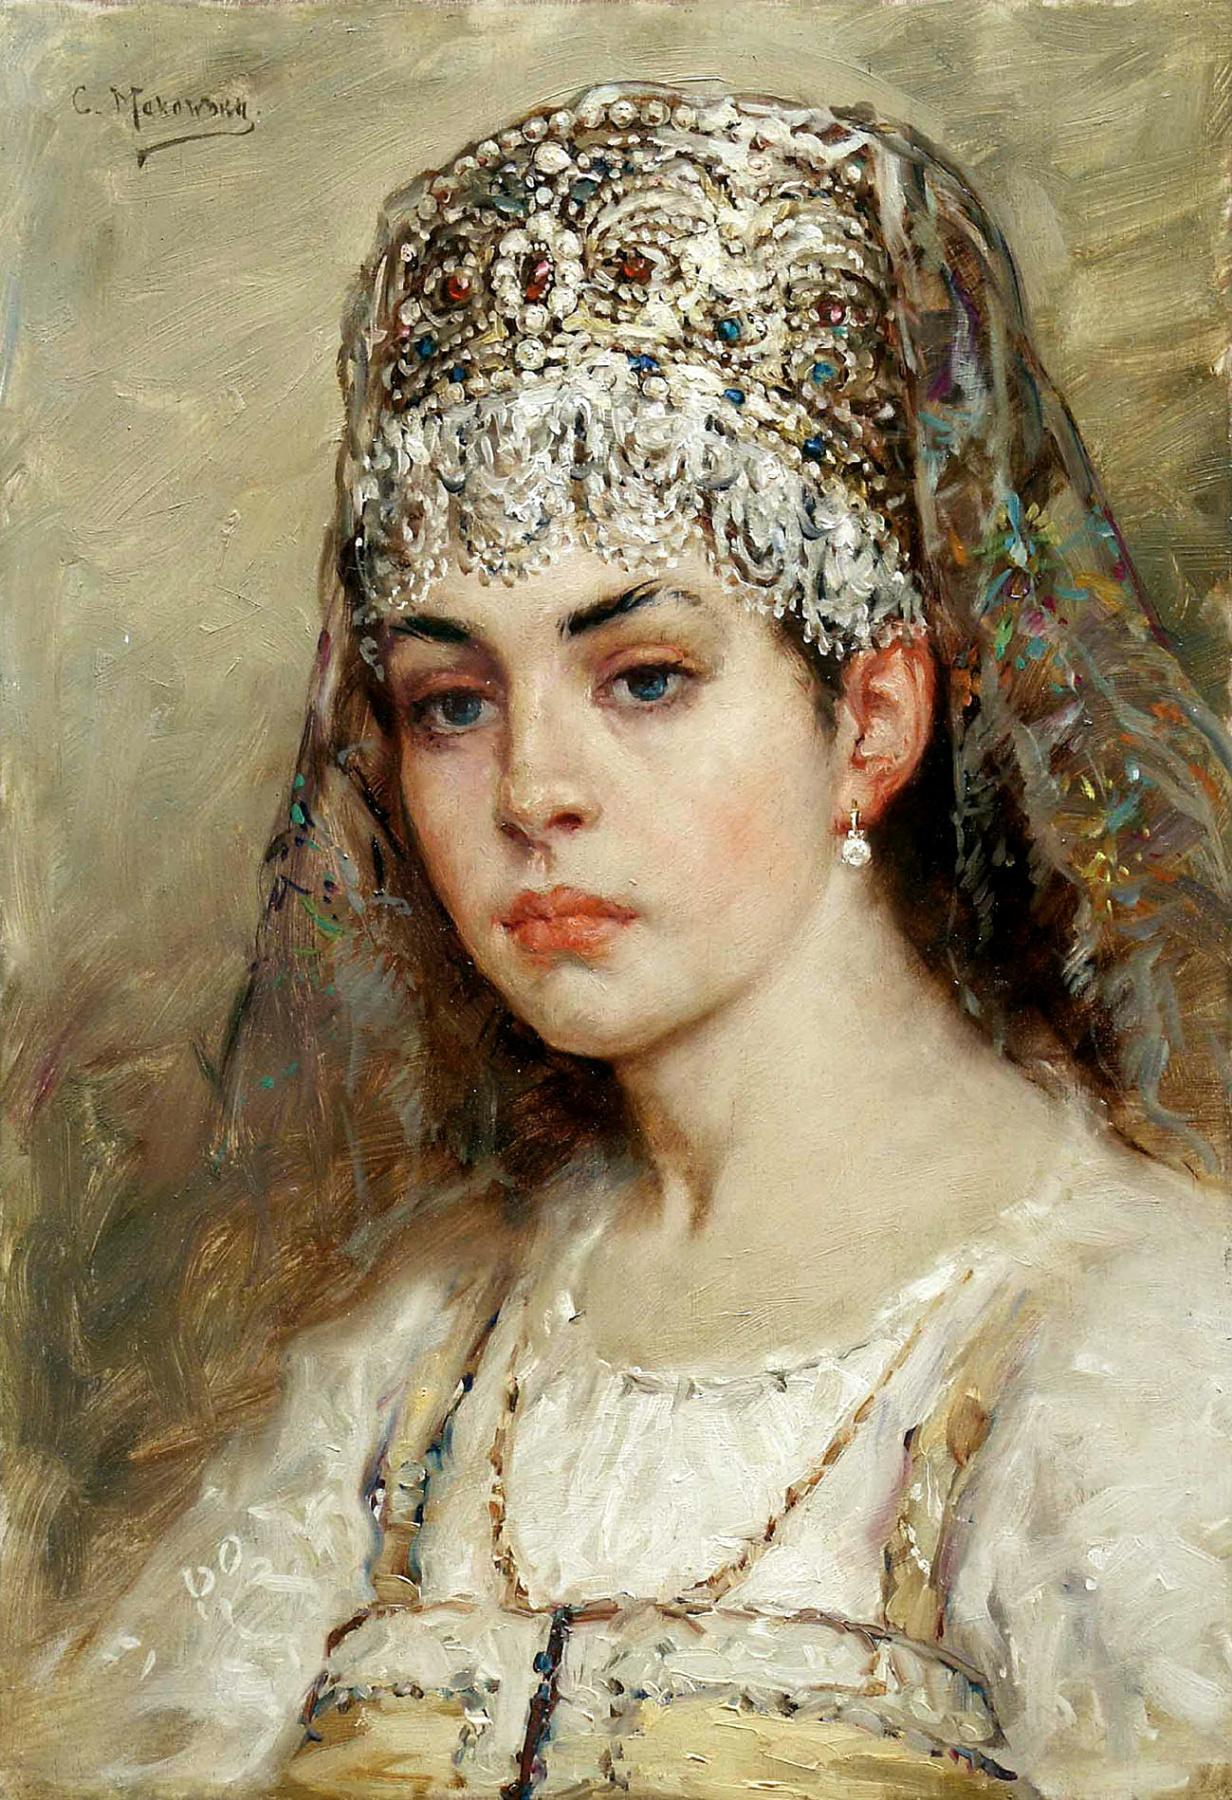 Konstantin Makovsky. The boyar's daughter